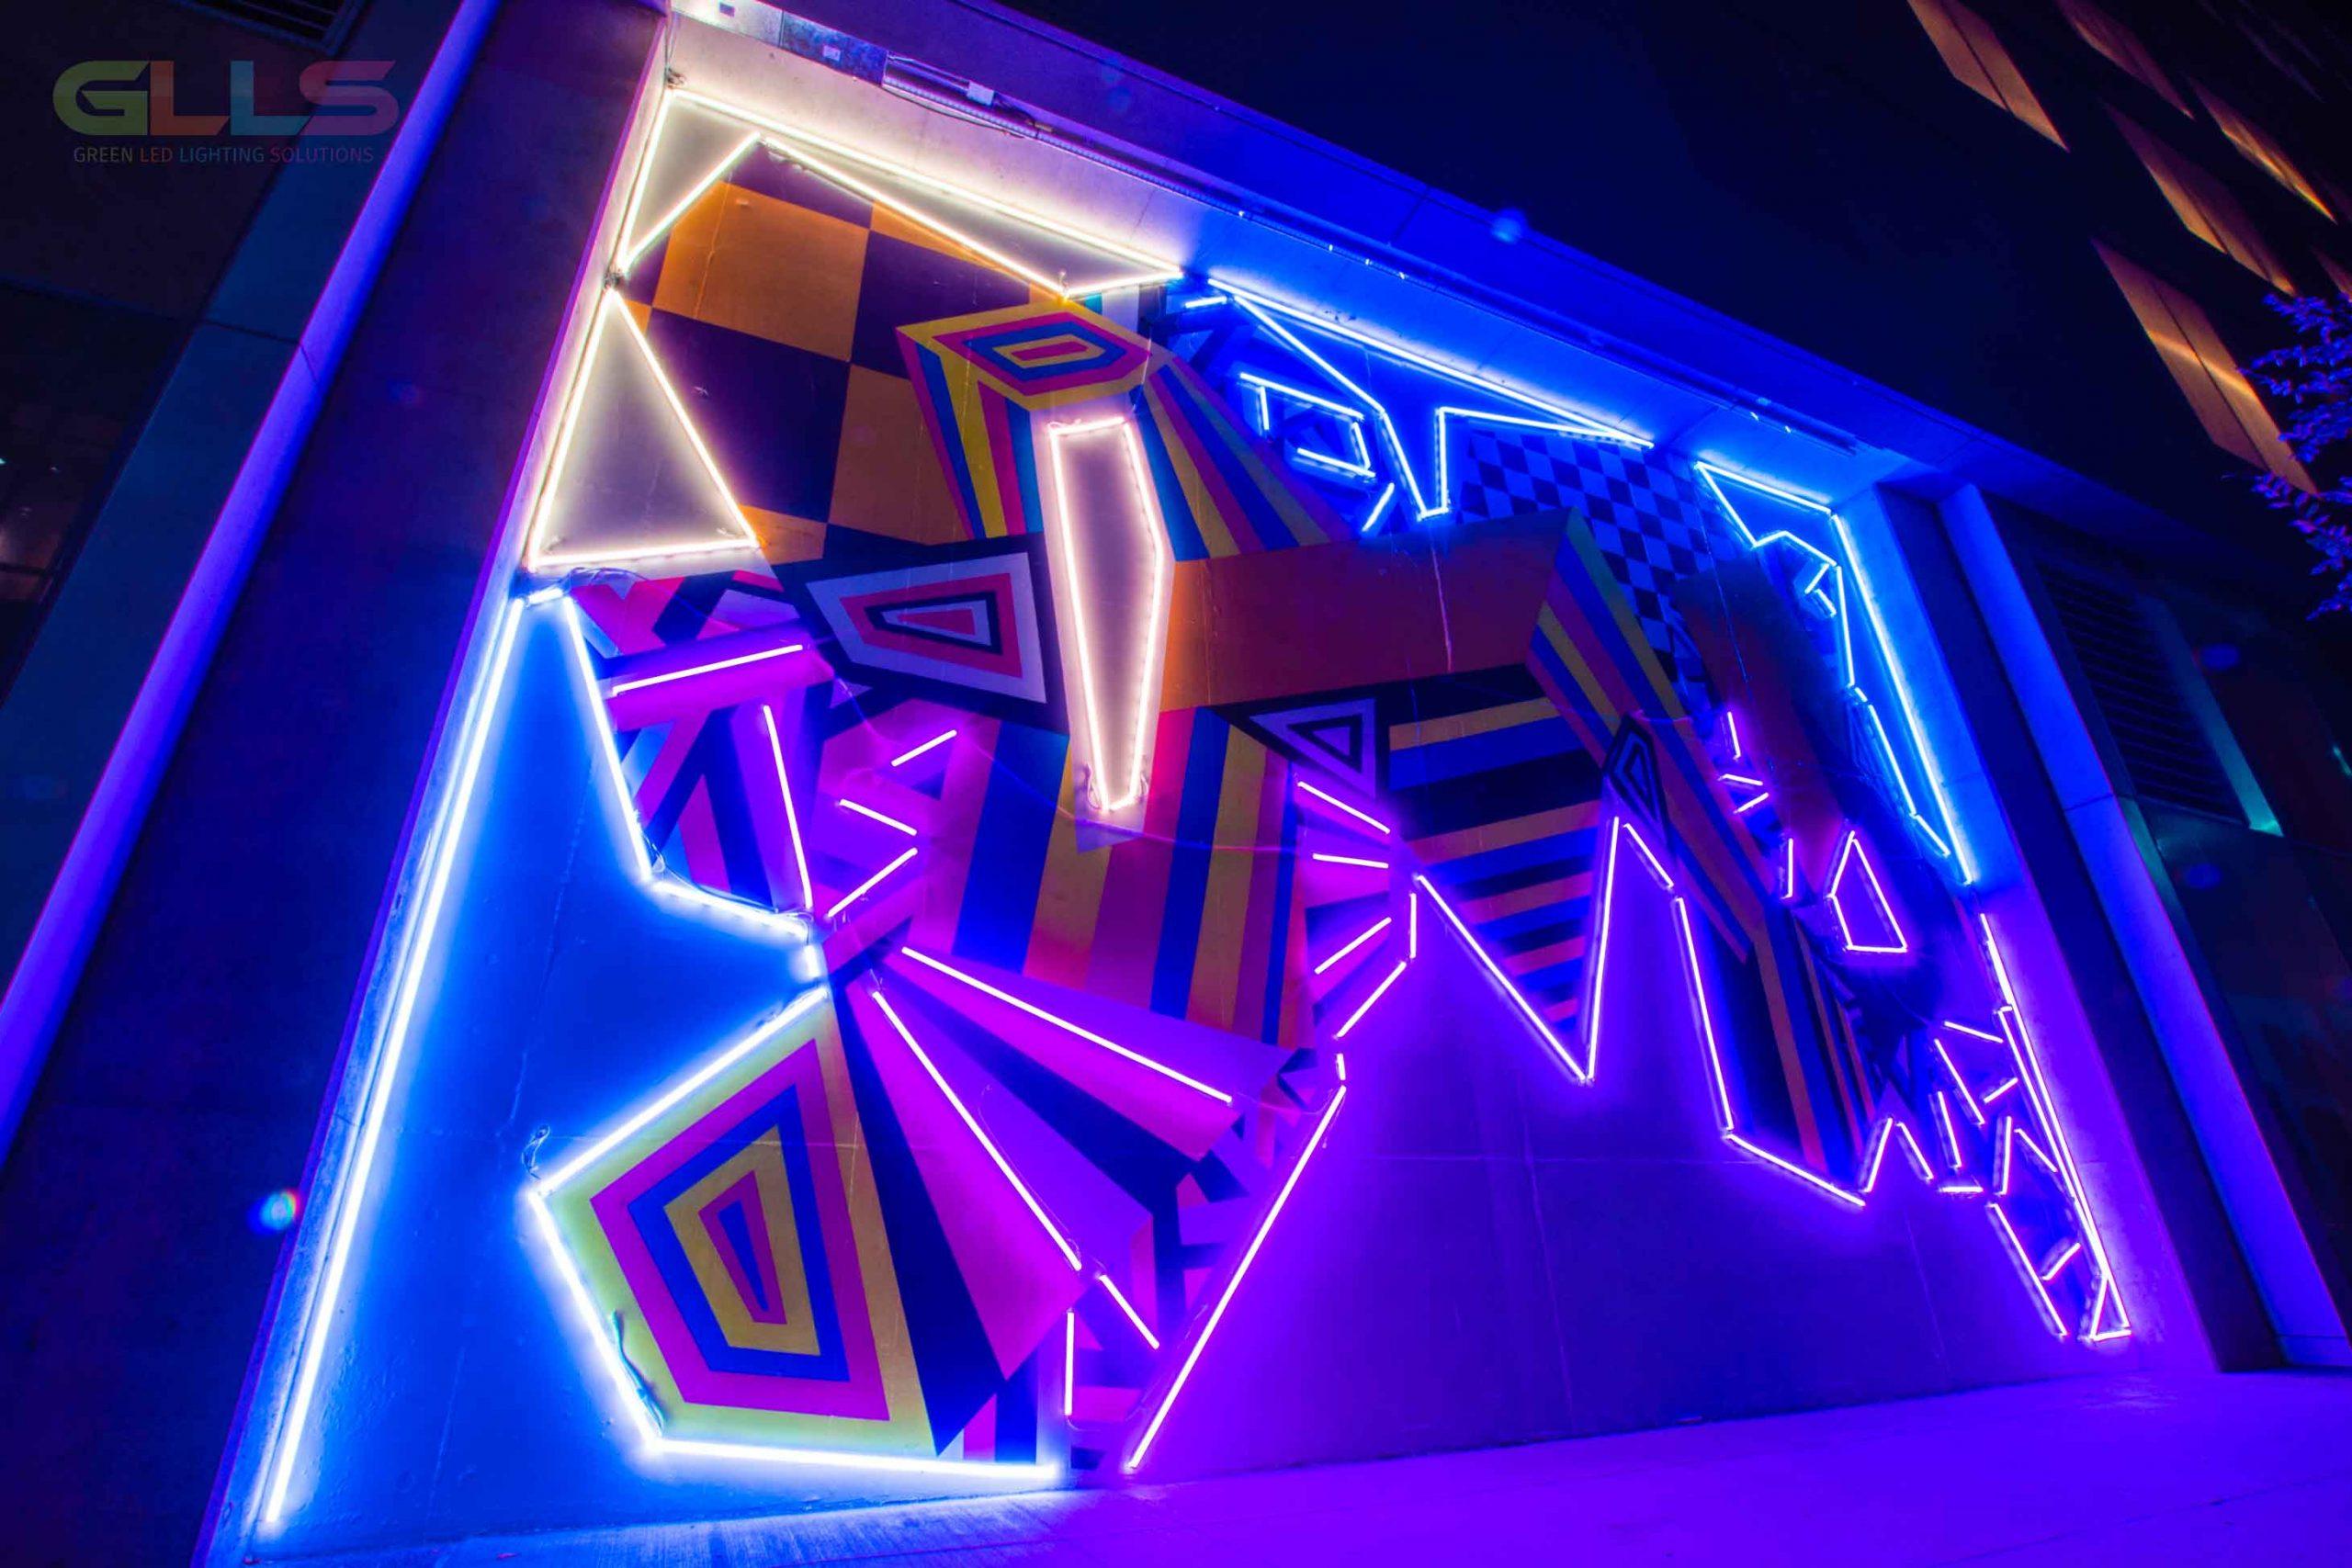 Chase-Melendez-Wall-Mural-Art-Cincinnati8